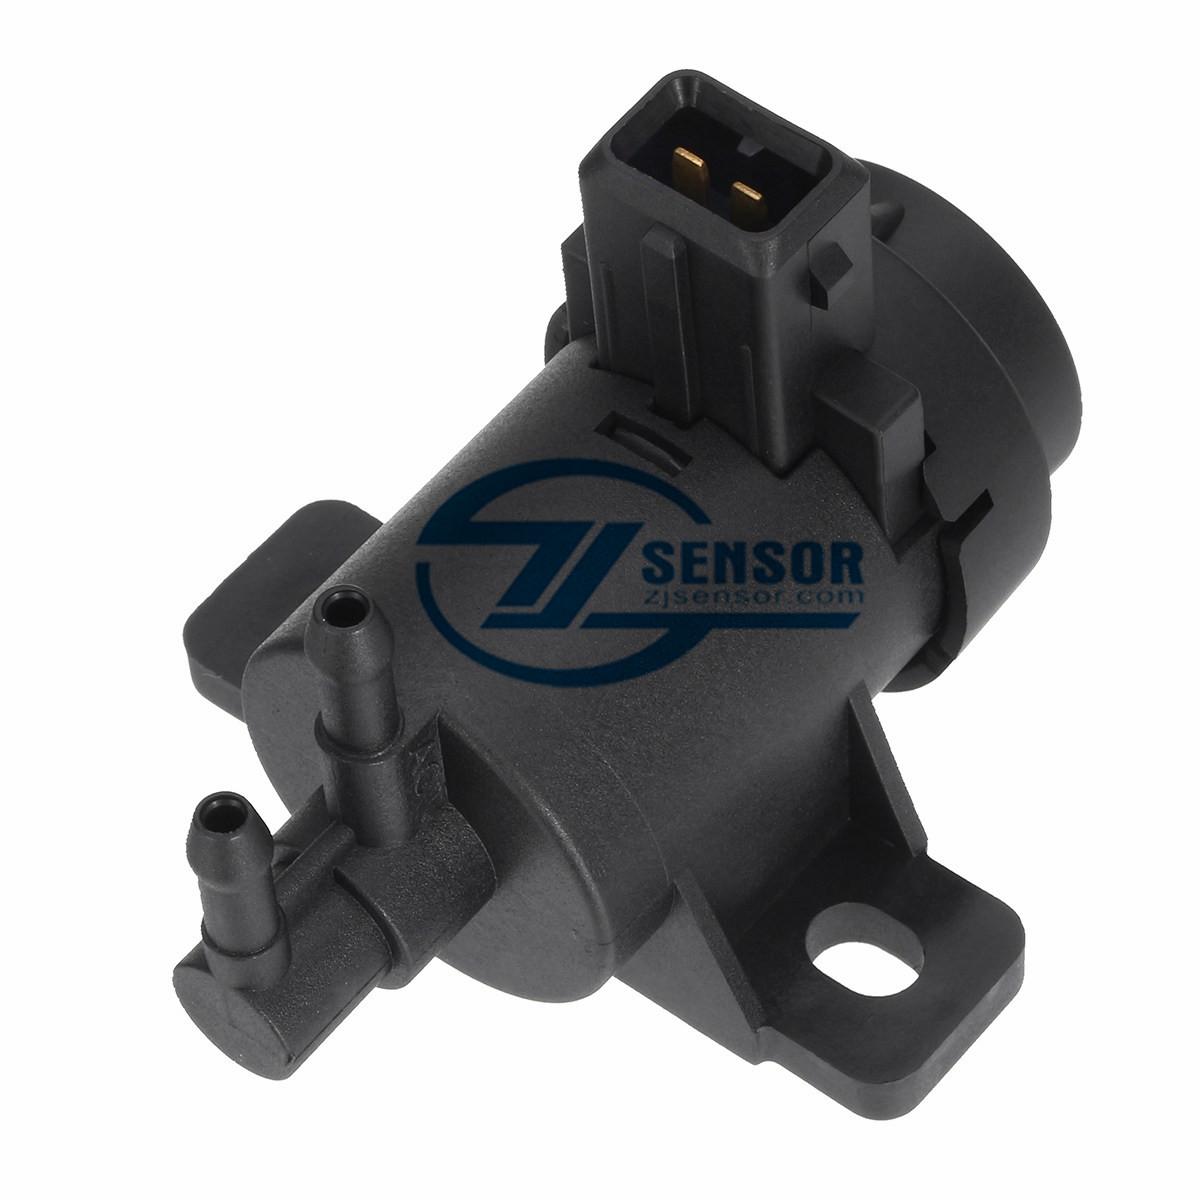 1495600QAA 14956-00QAA Turbo Boost Pressure Solenoid Valve 7700109099 7700113071 For Renault/Vauxhall Movano Vivaro 1.9 2.0 2.5 For Diesel